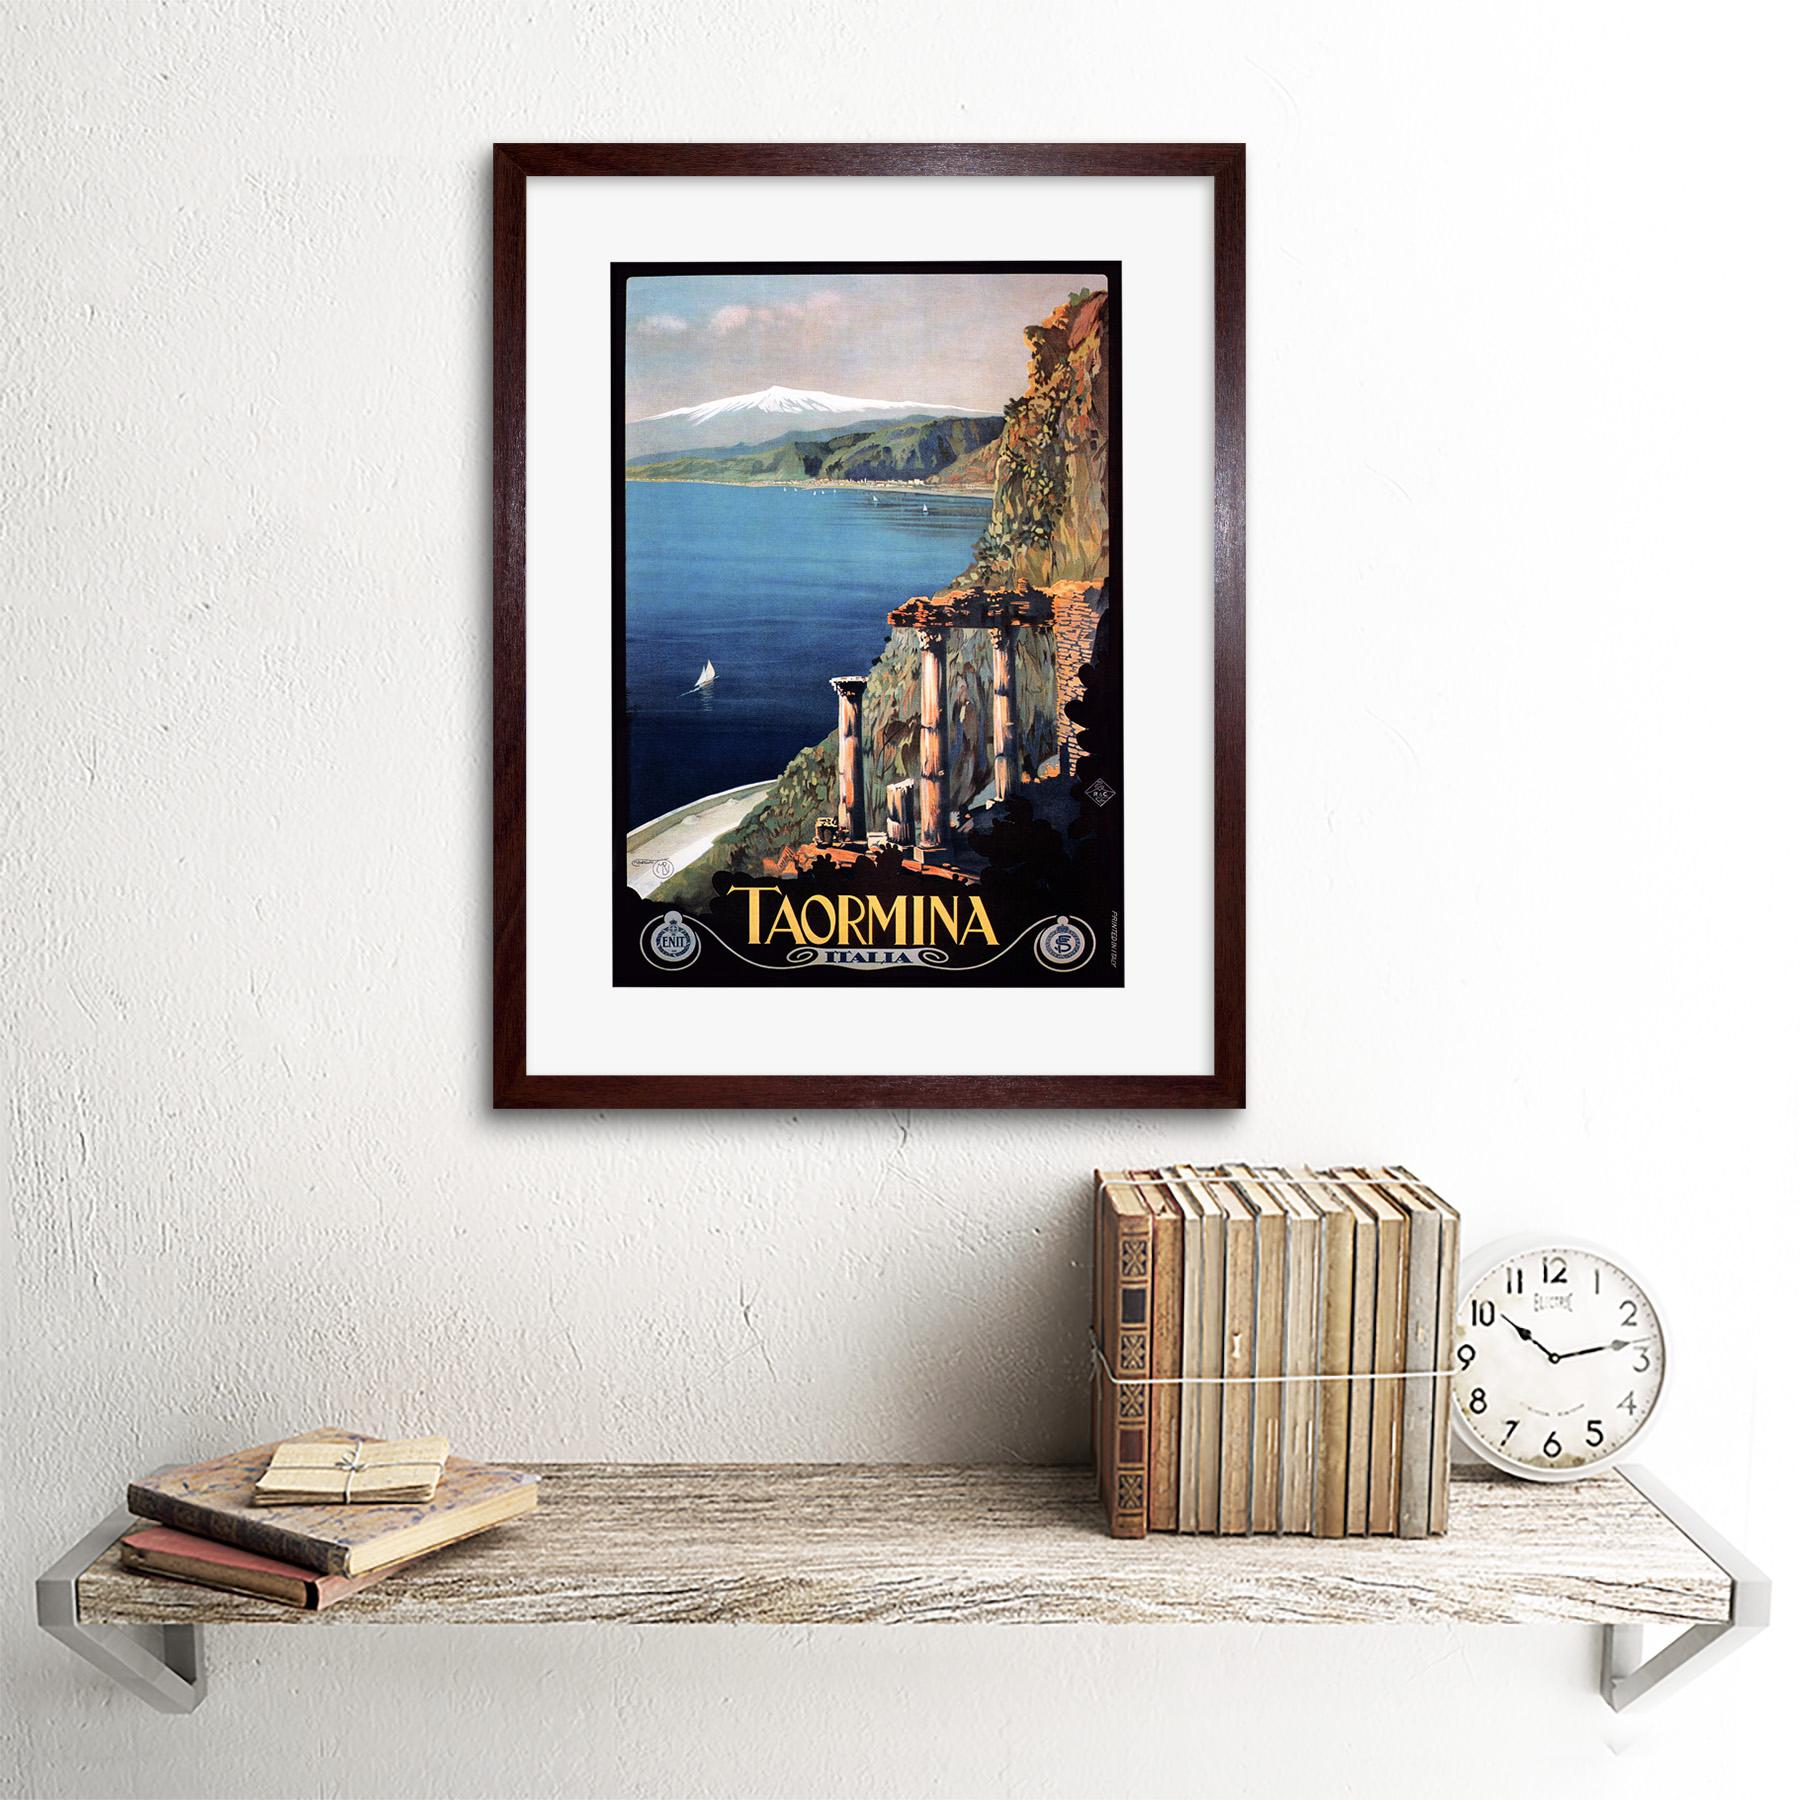 thumbnail 8 - Travel Taormina Sicily Etna Greek Theatre Italy Framed Art Print 12x16 Inch